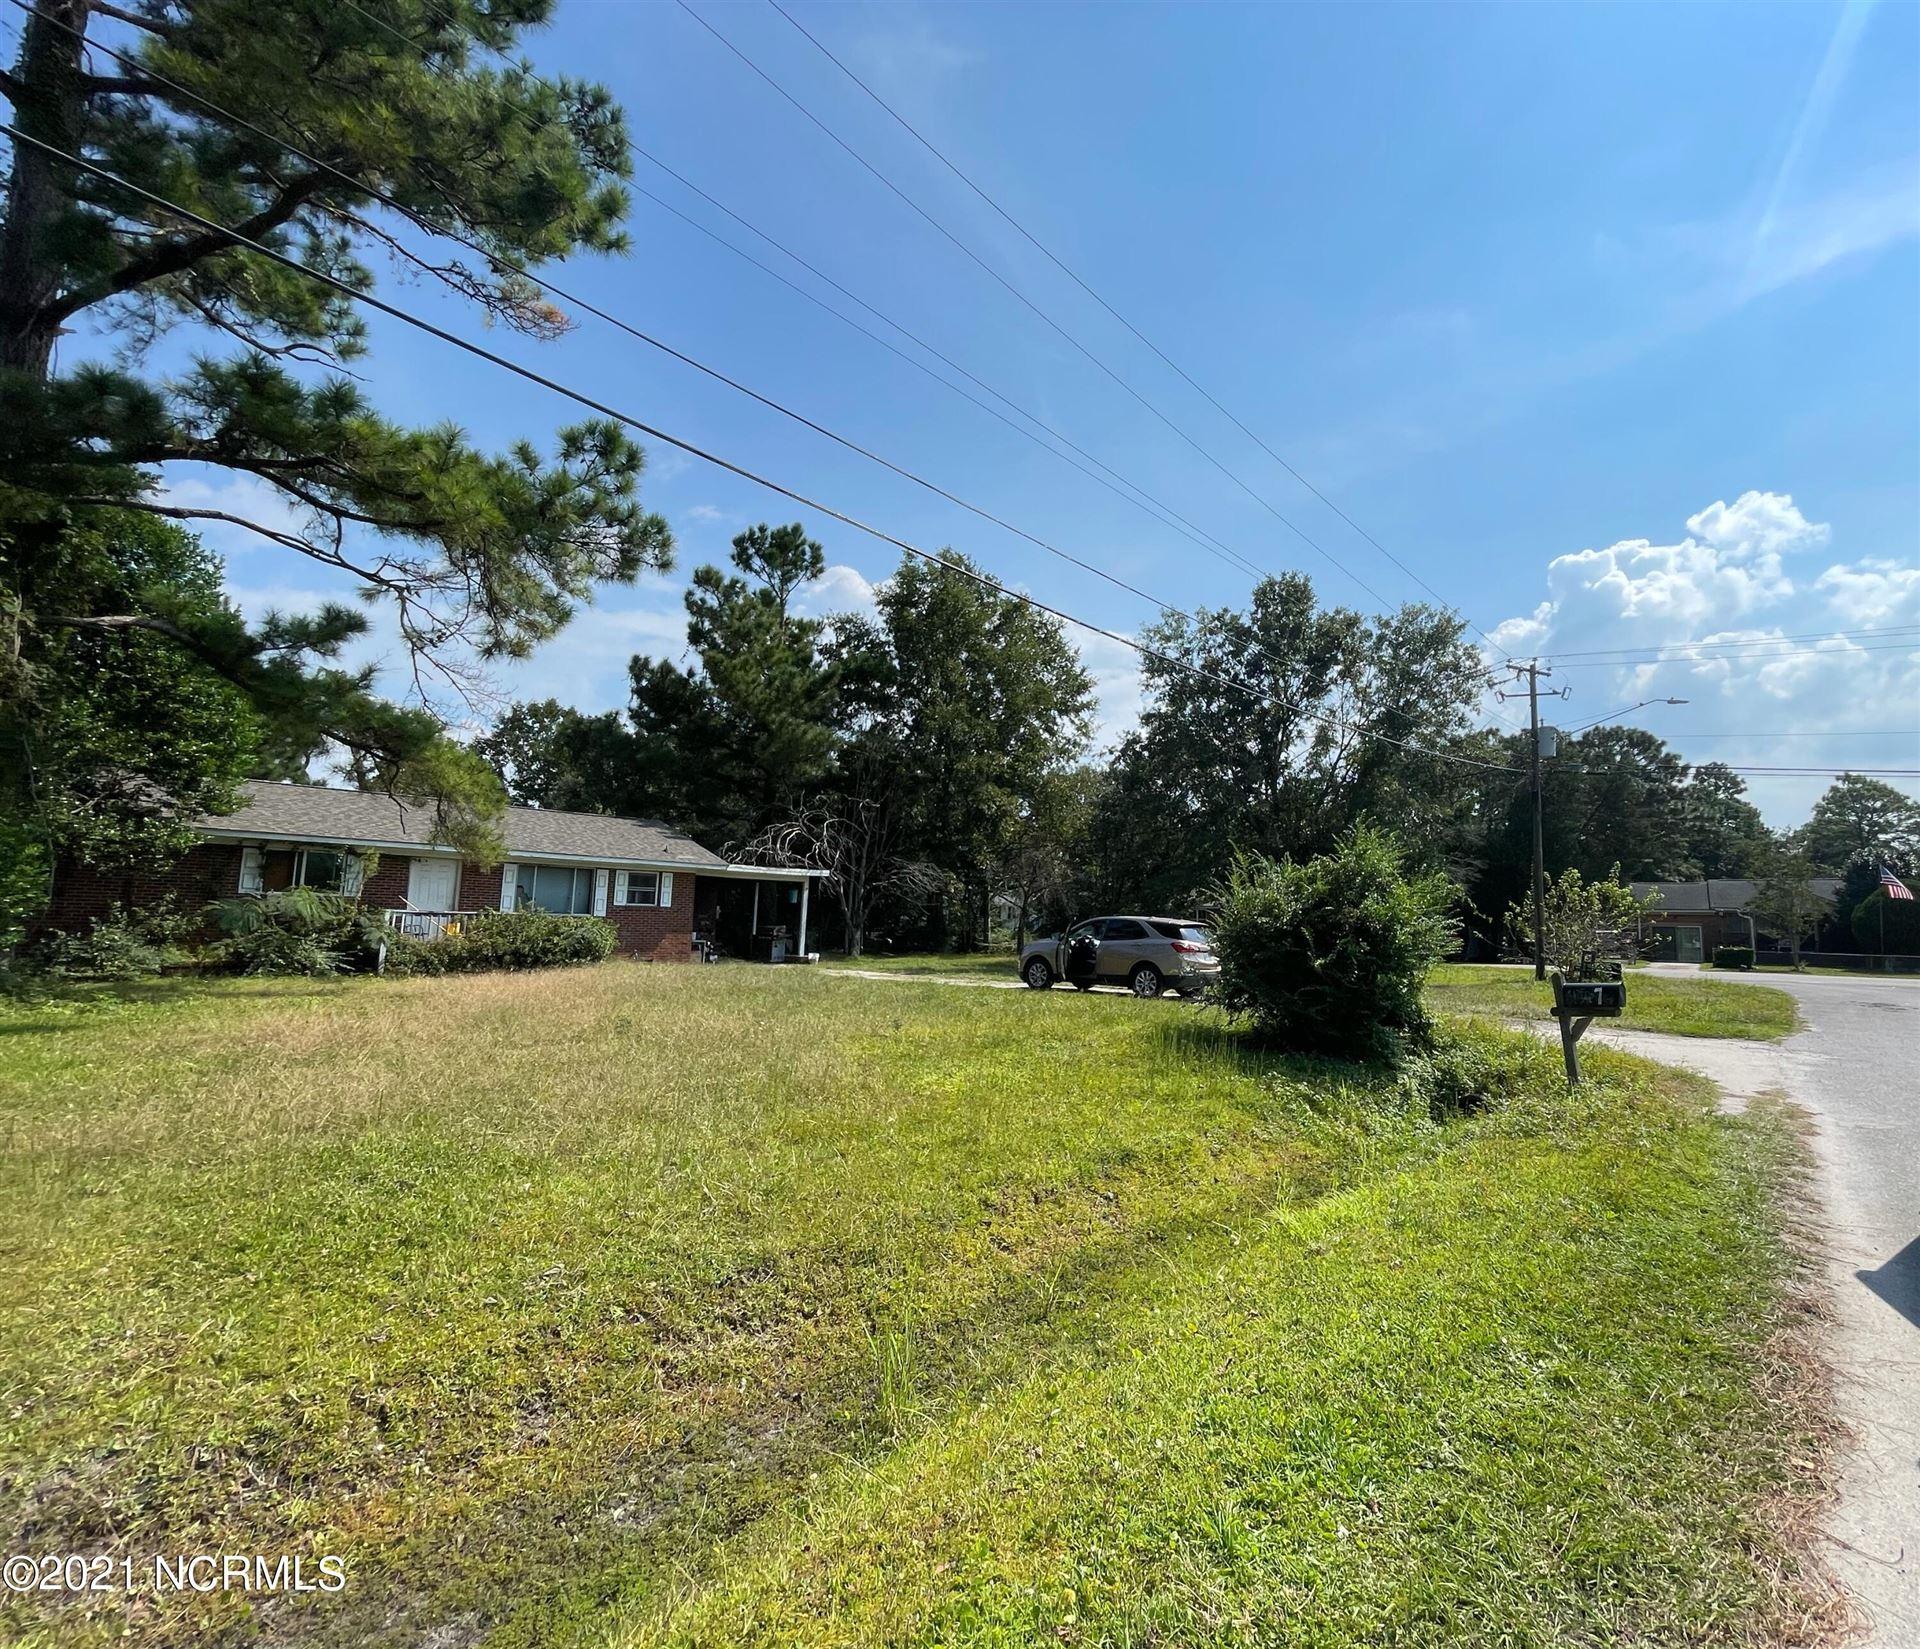 Photo of 117 Edwards Street, Wilmington, NC 28405 (MLS # 100294799)